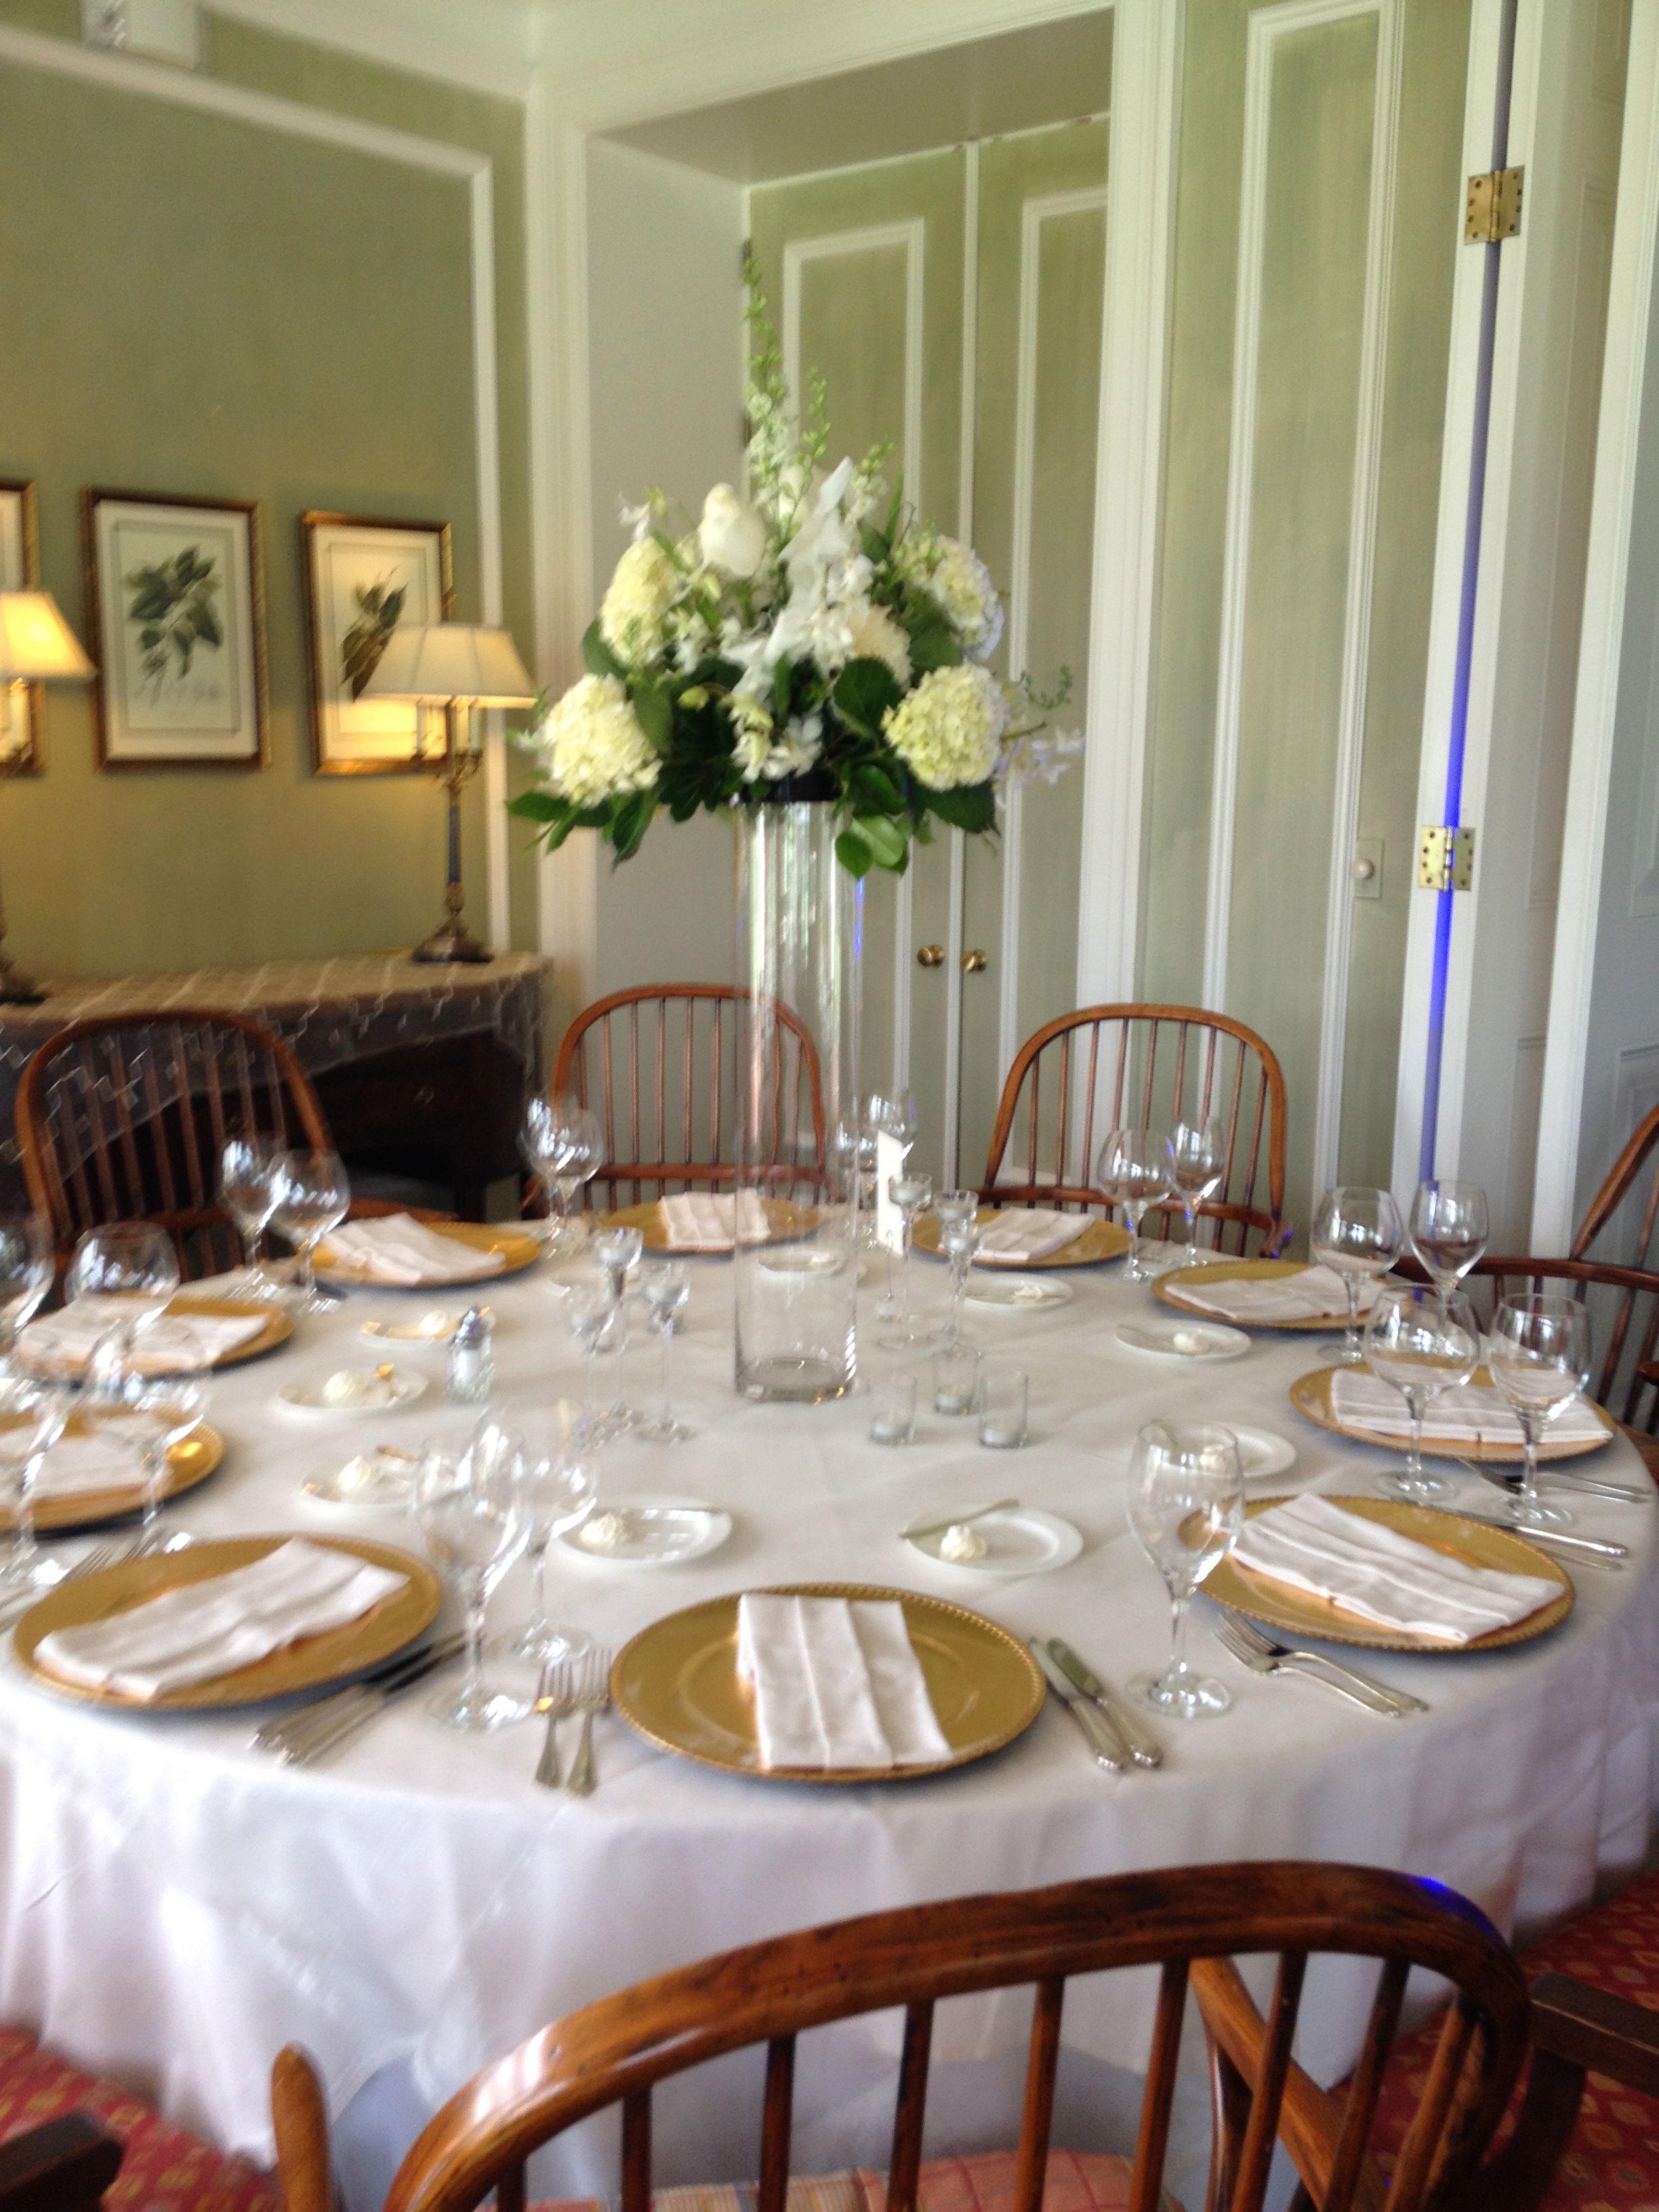 Table decor goldwhite wedding i own the decor shown table decor goldwhite wedding i own the decor shown tablecloth reviewsmspy